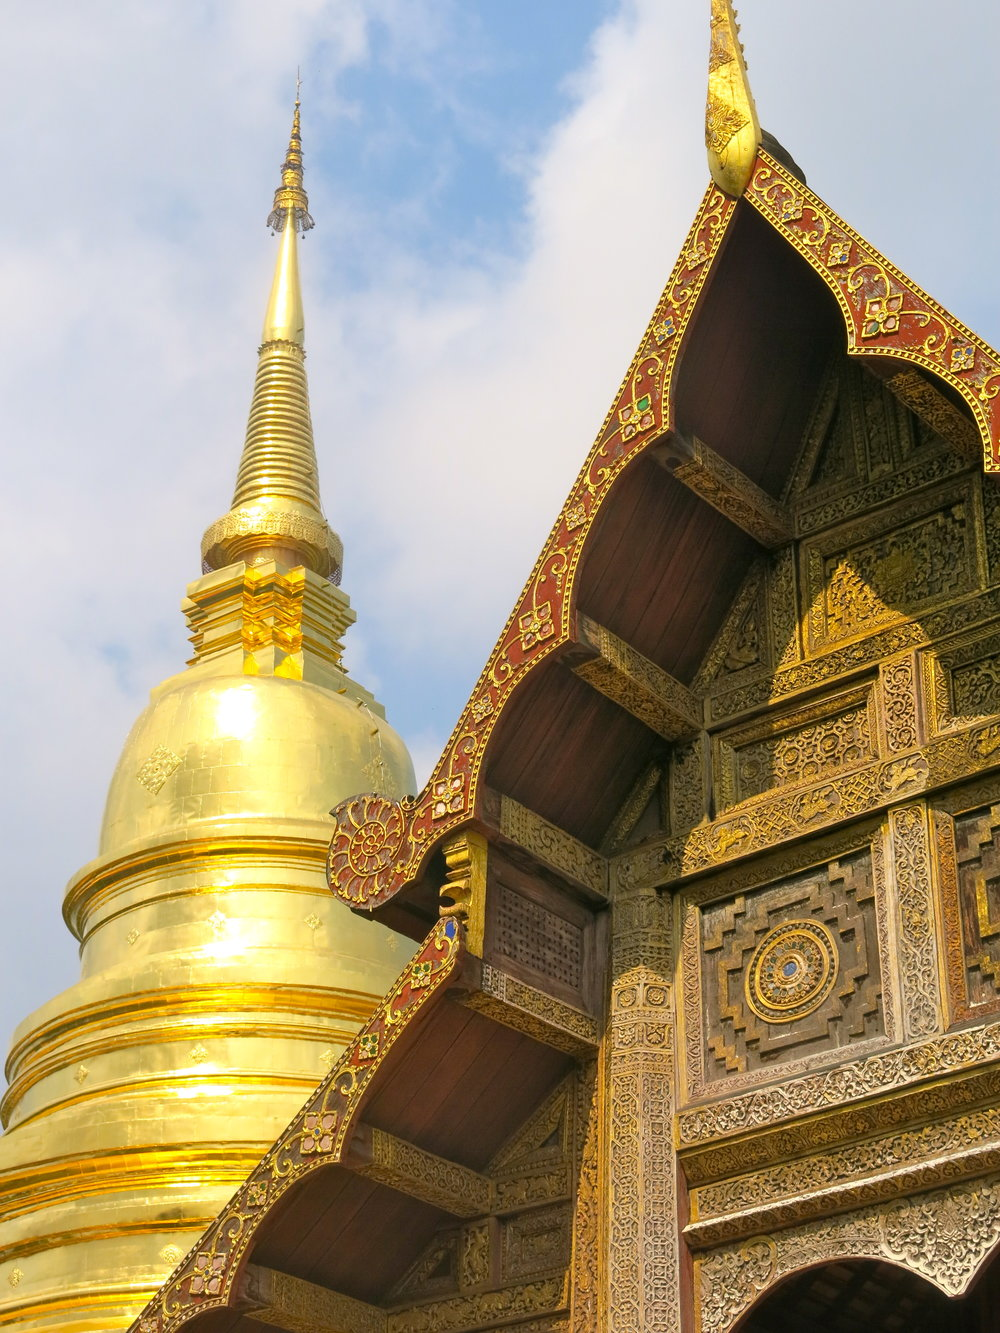 Buddhist monks still live in the complex